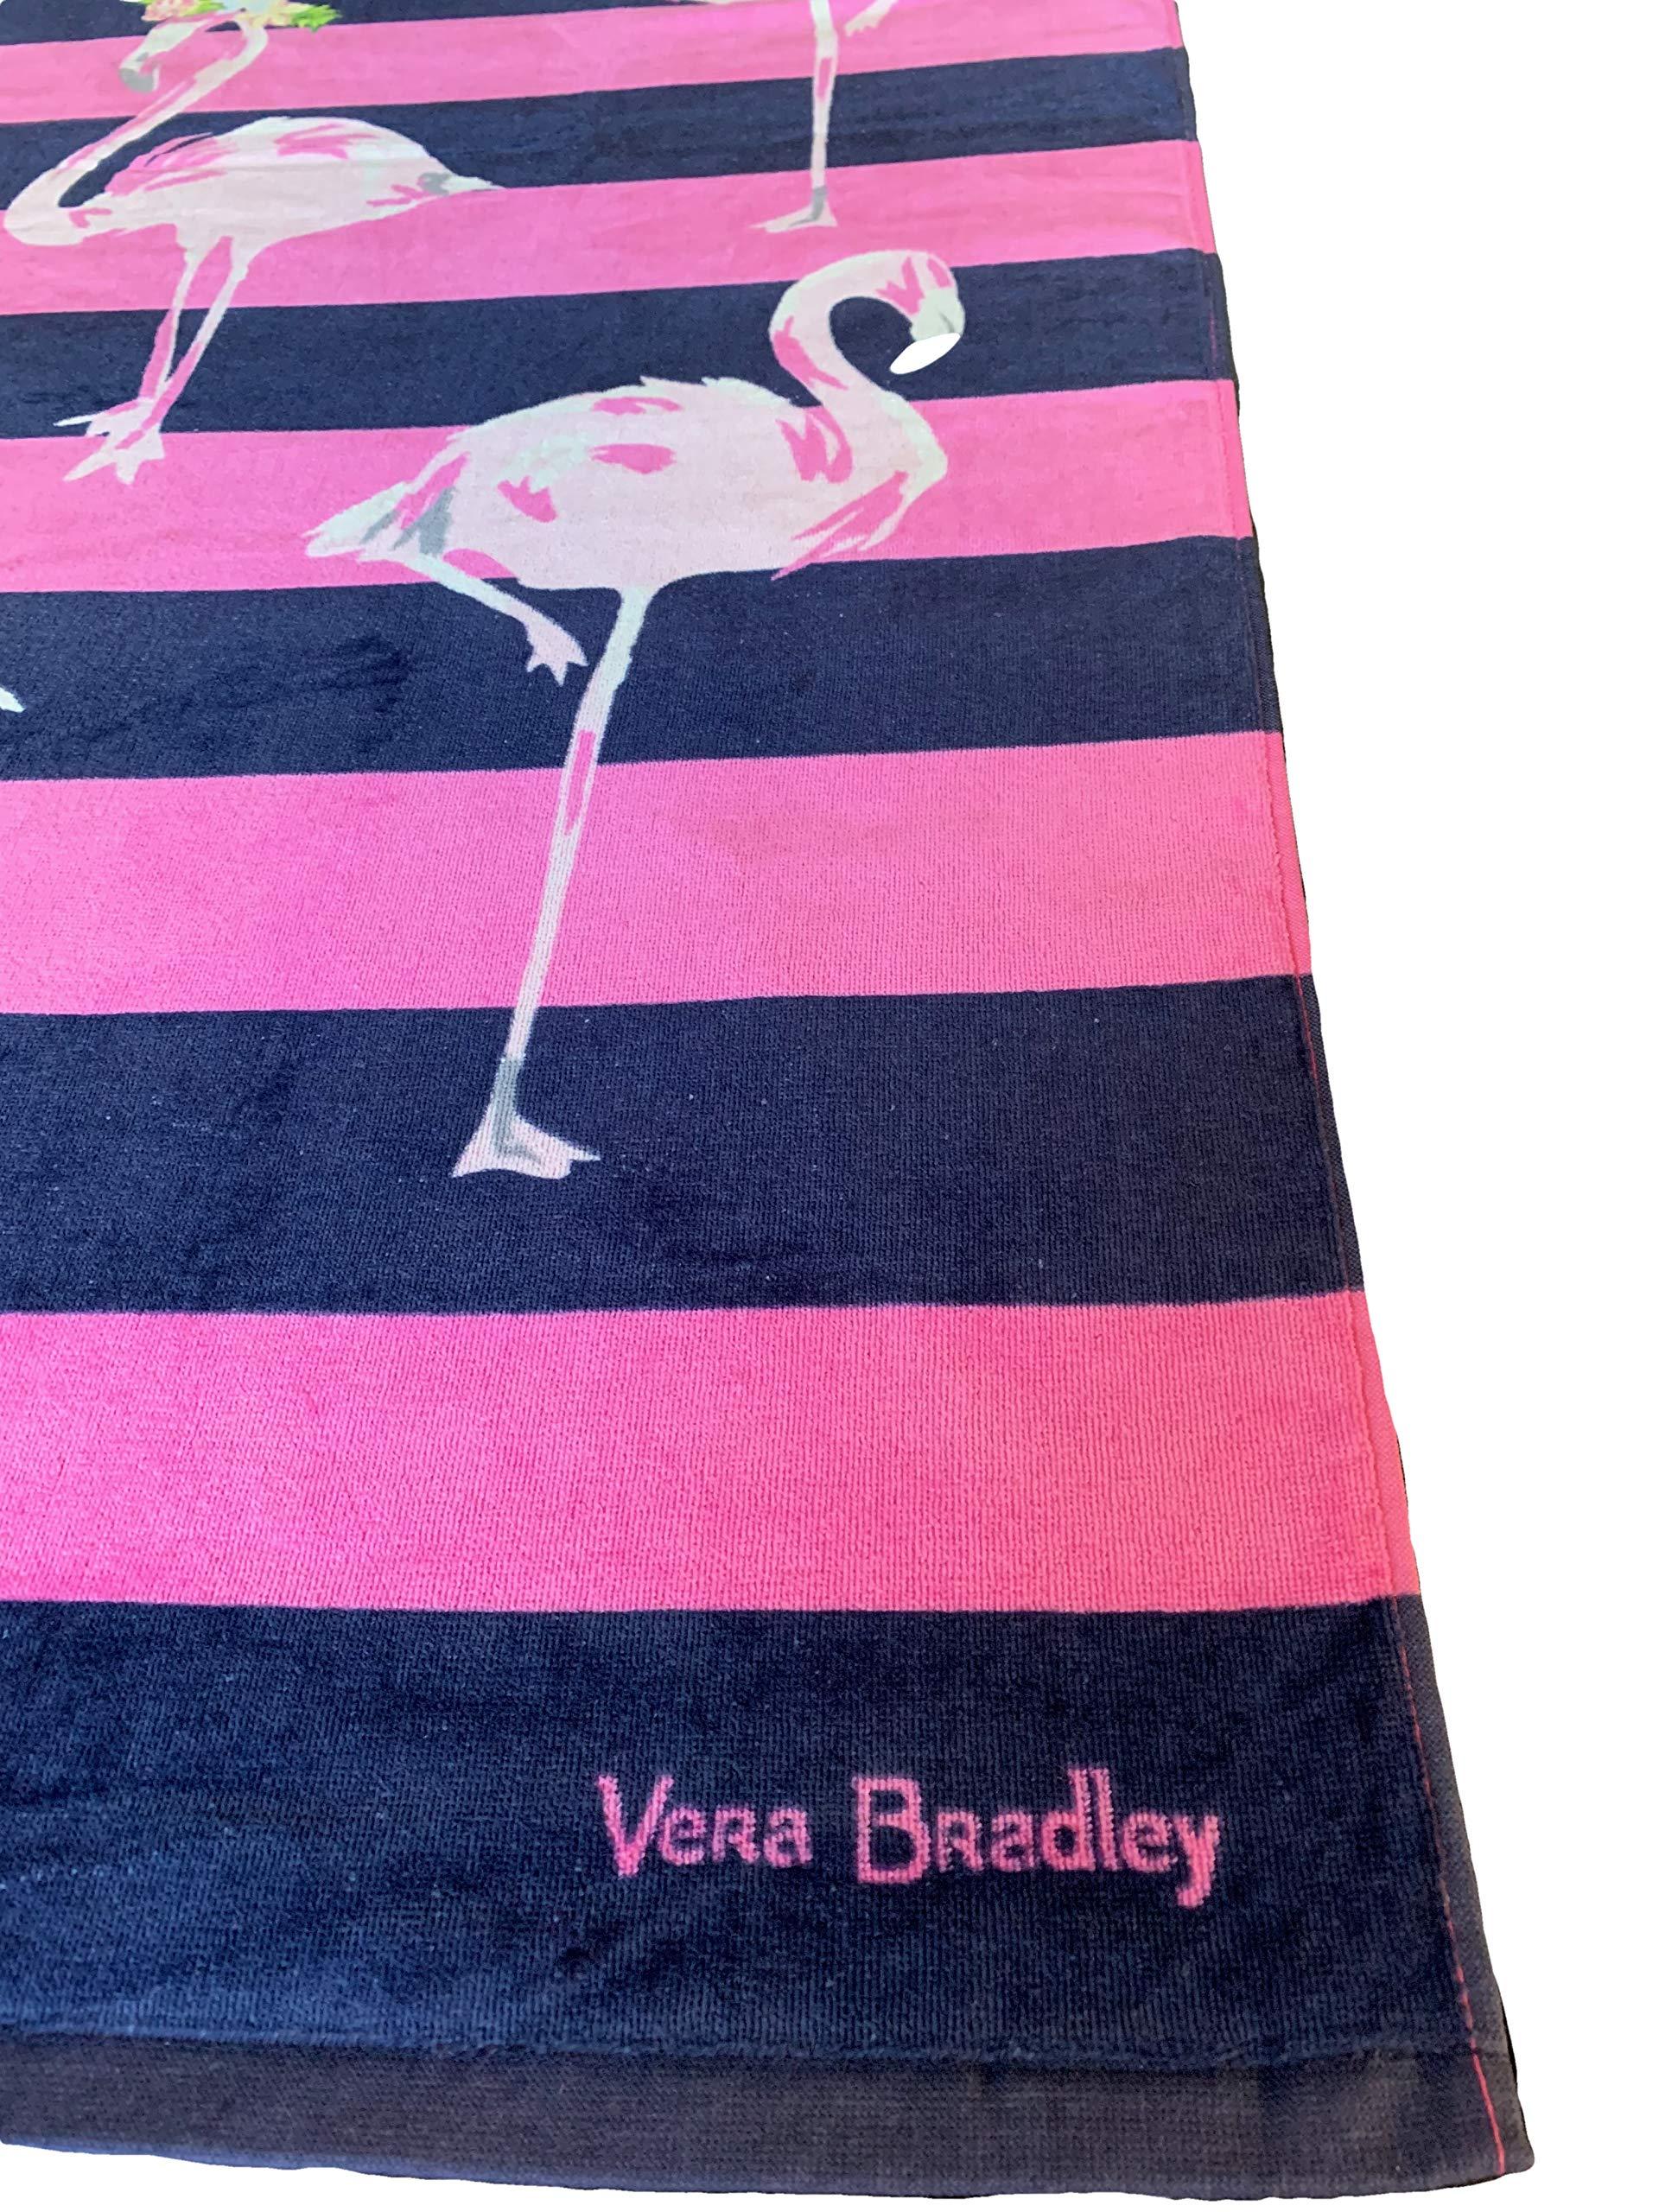 Vera Bradley Flamingo Fiesta Beach Towel 33'' x 66'' by Vera Bradley (Image #2)